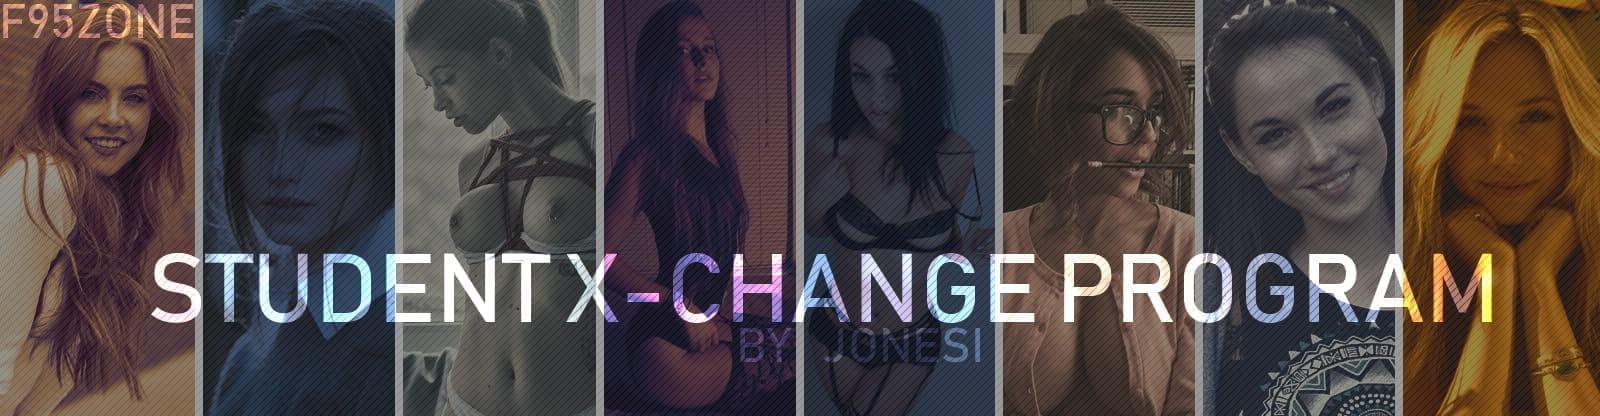 Student X Change